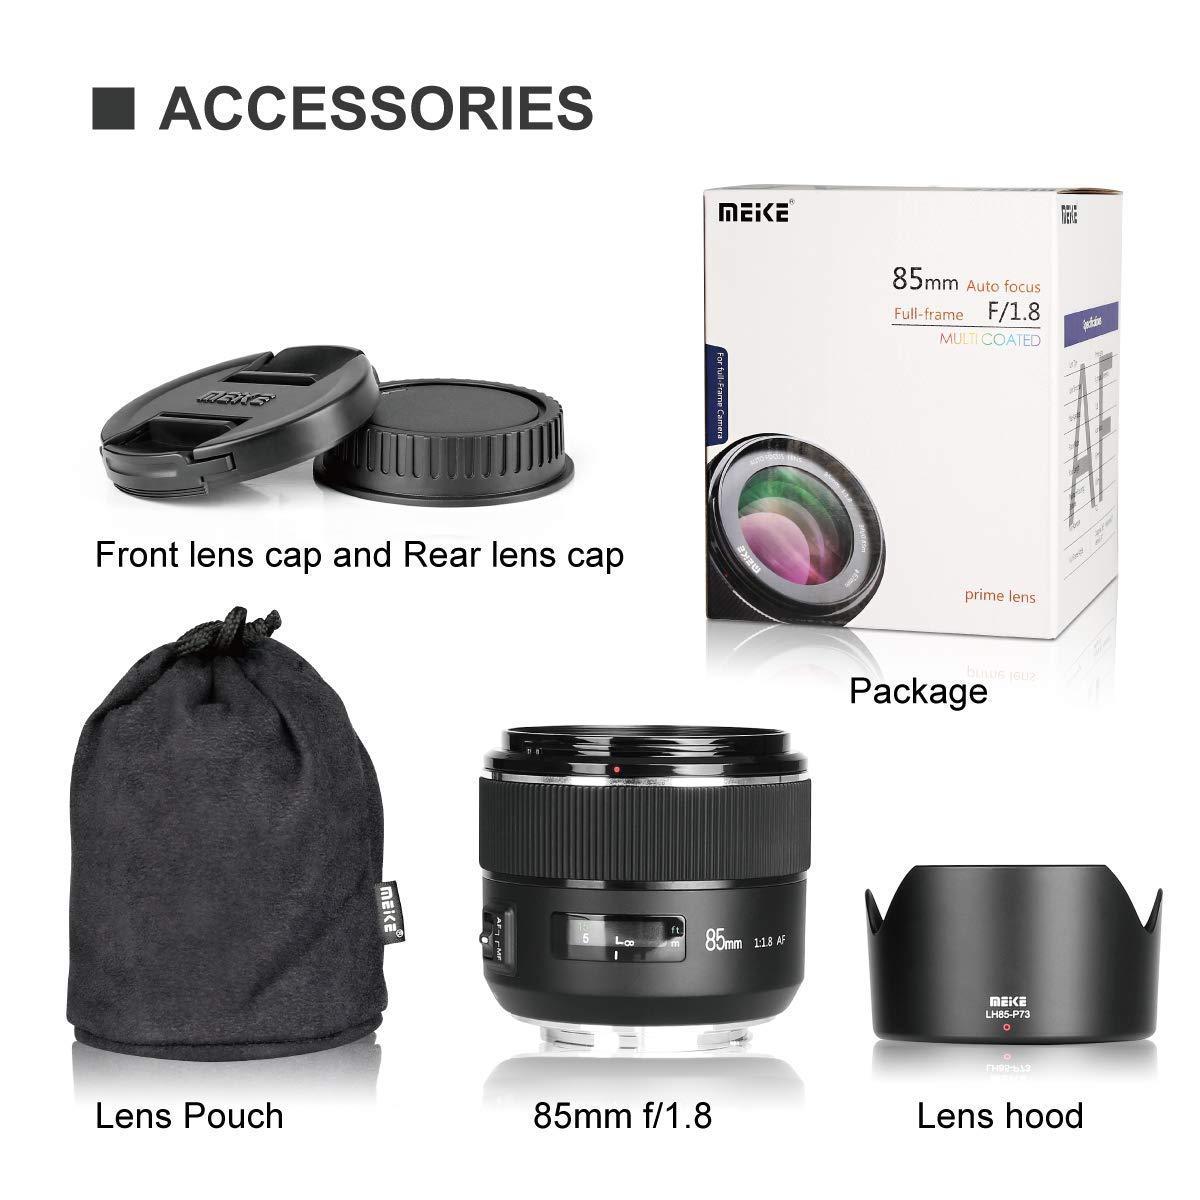 Meike カメラアクセサリー ソニー用 バッテリーグリップ スピードライト マクロエクステンションチューブセット lens MKSA-P lens 85mm1.8canon B07HVVY6SD